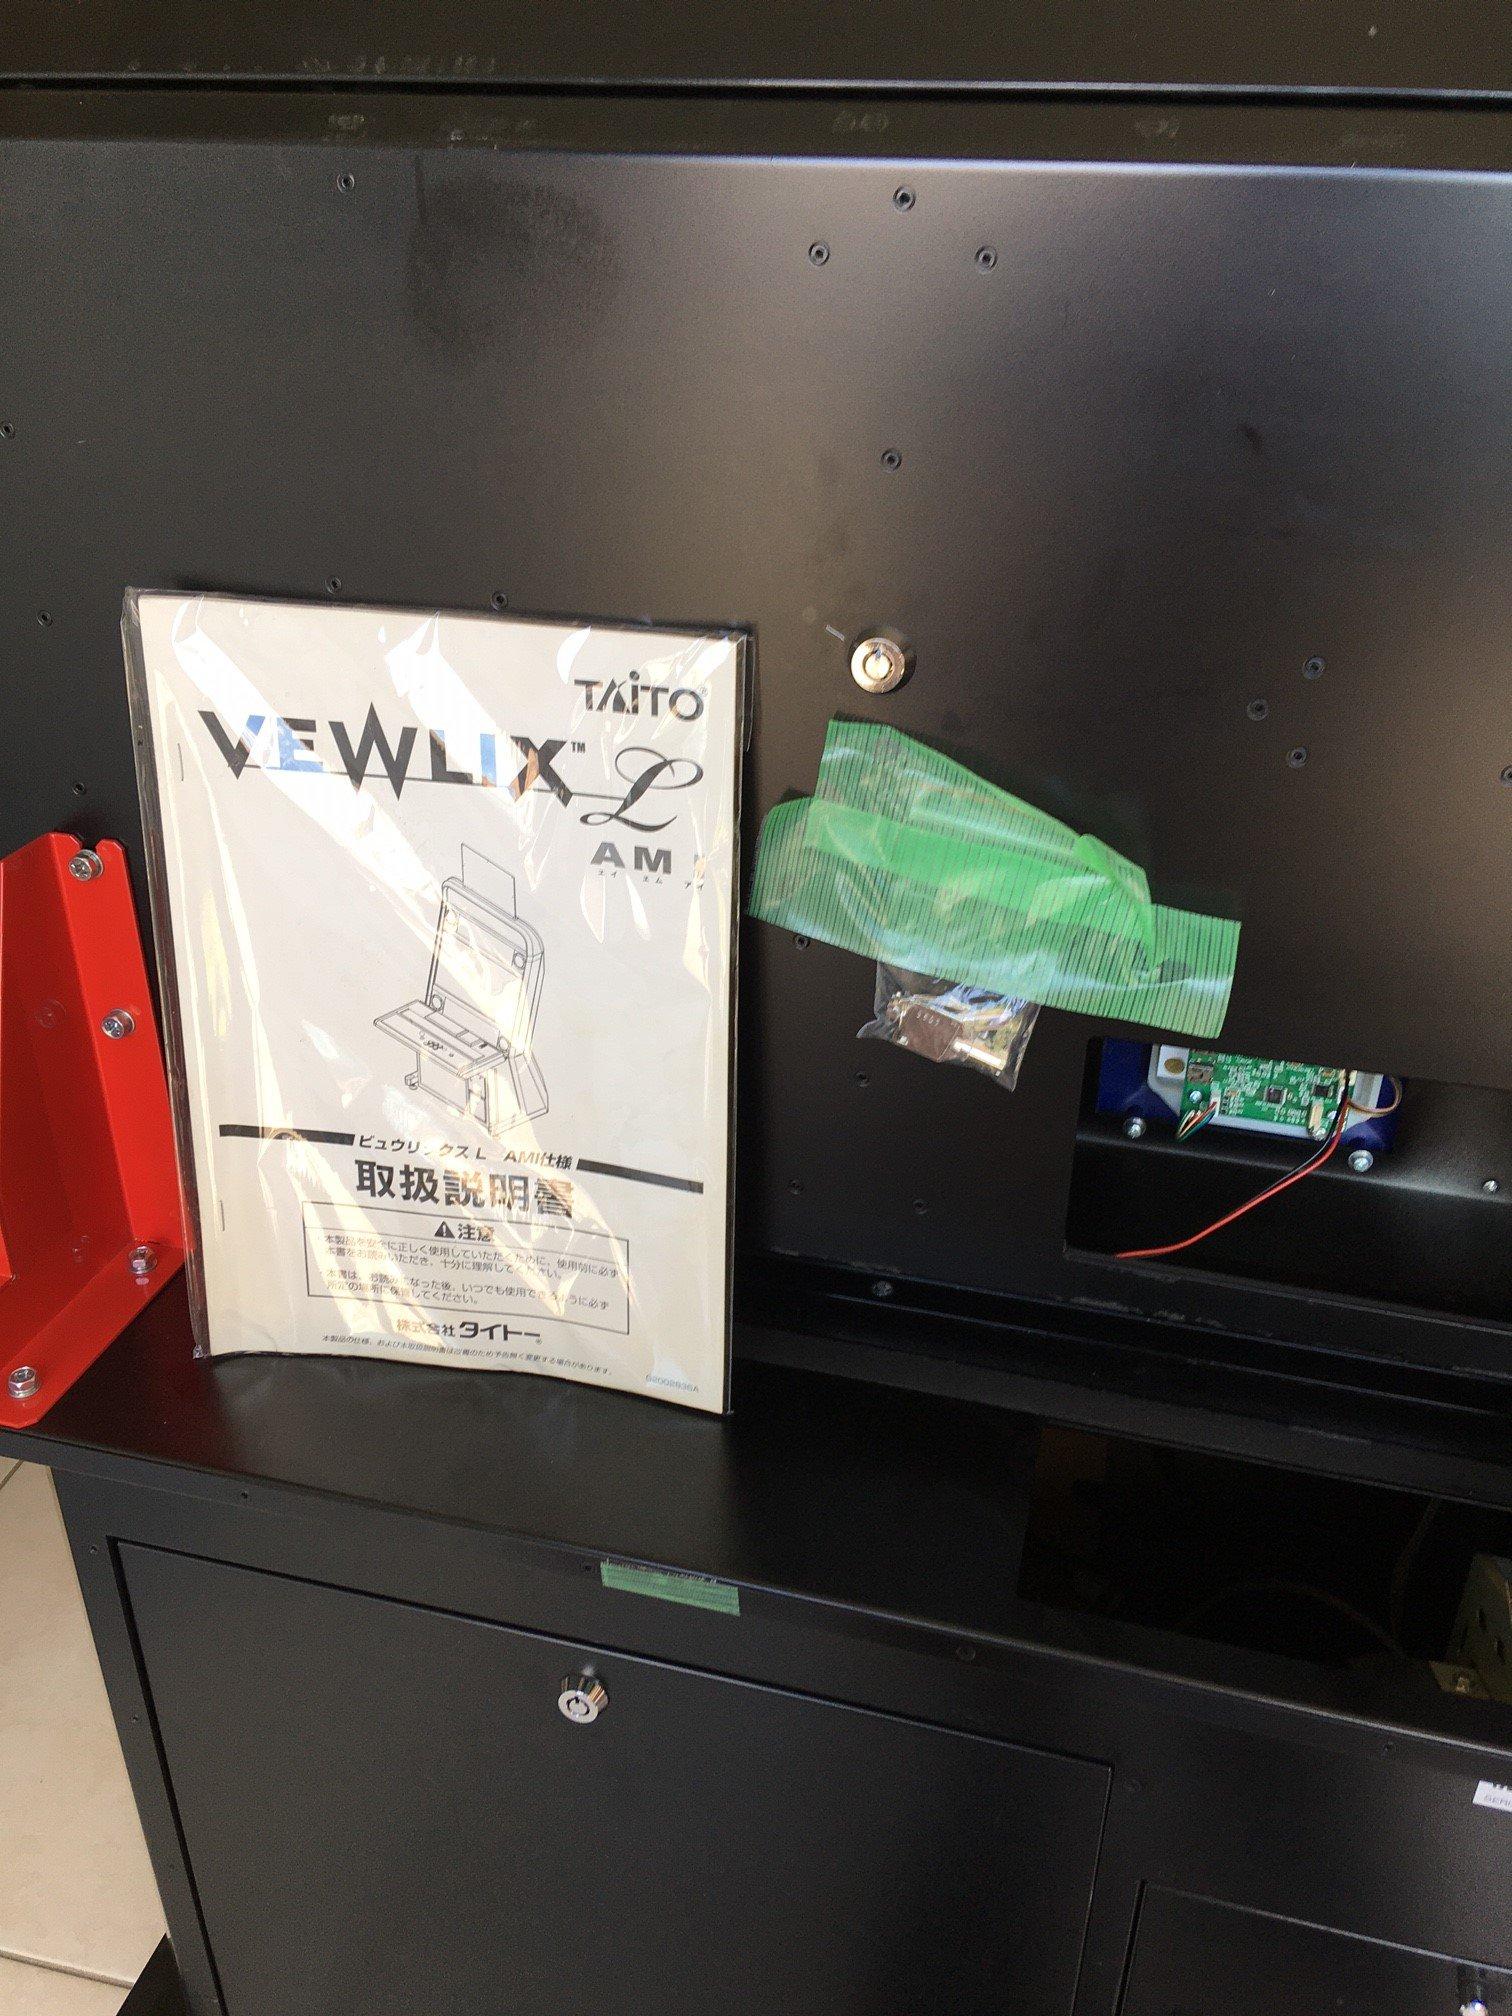 [WIP 20%] Vewlix L, l'expérience Rklok. - Page 2 210629034448110726